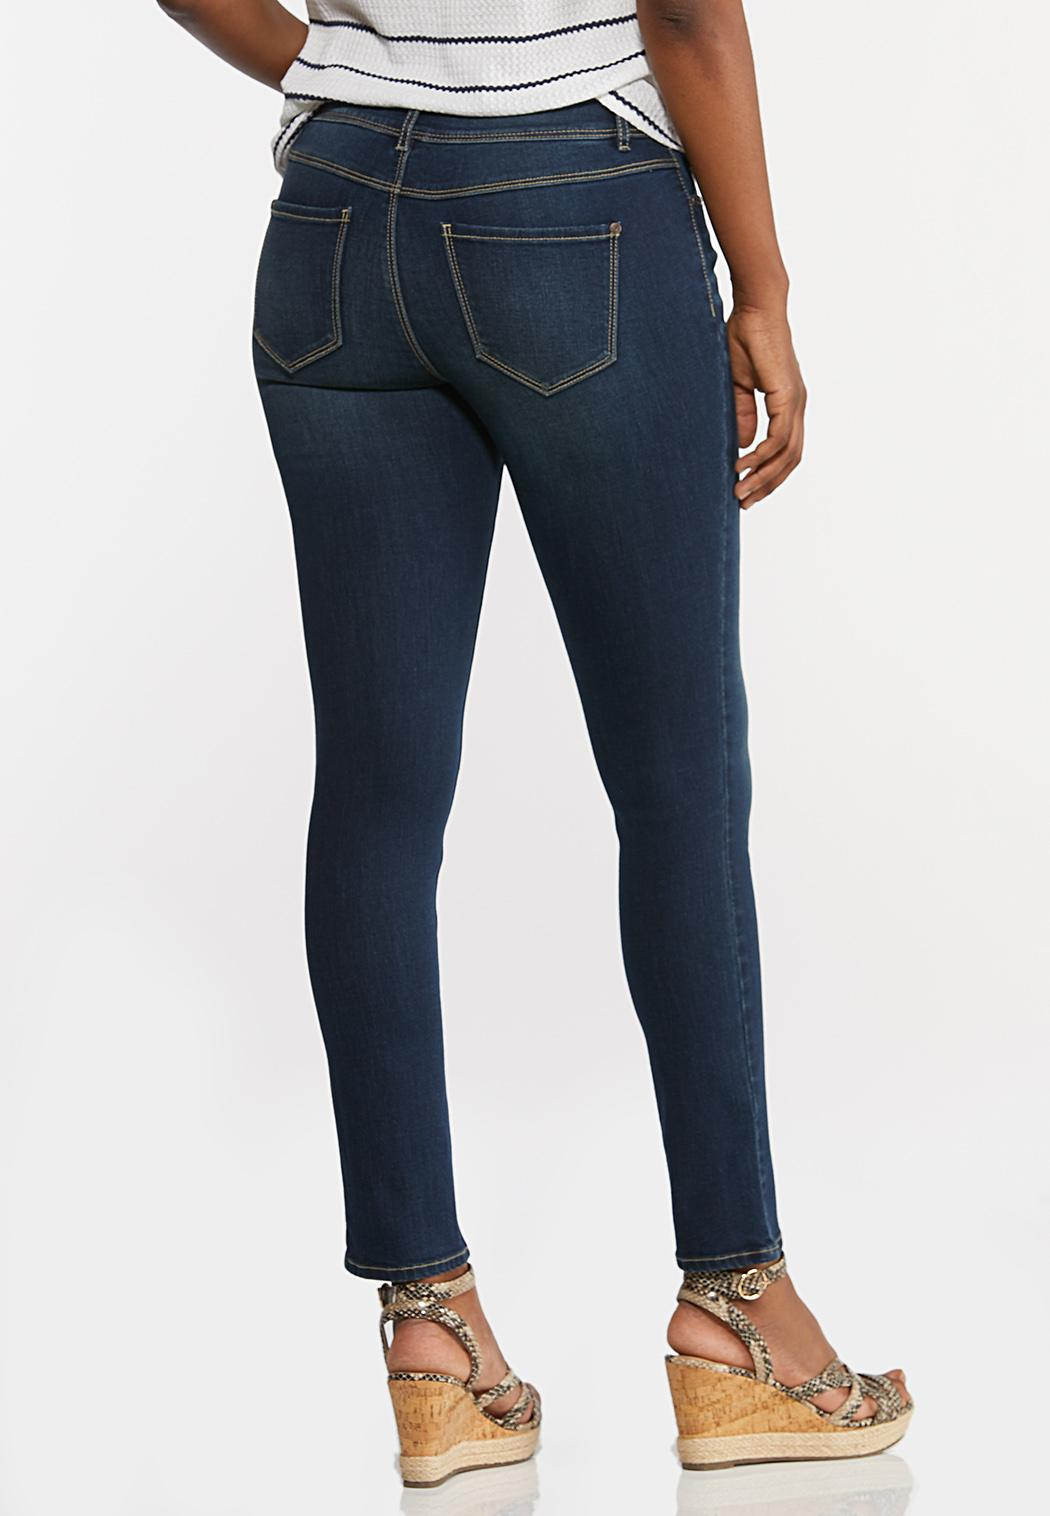 Petite Skinny Jeans (Item #44332070)